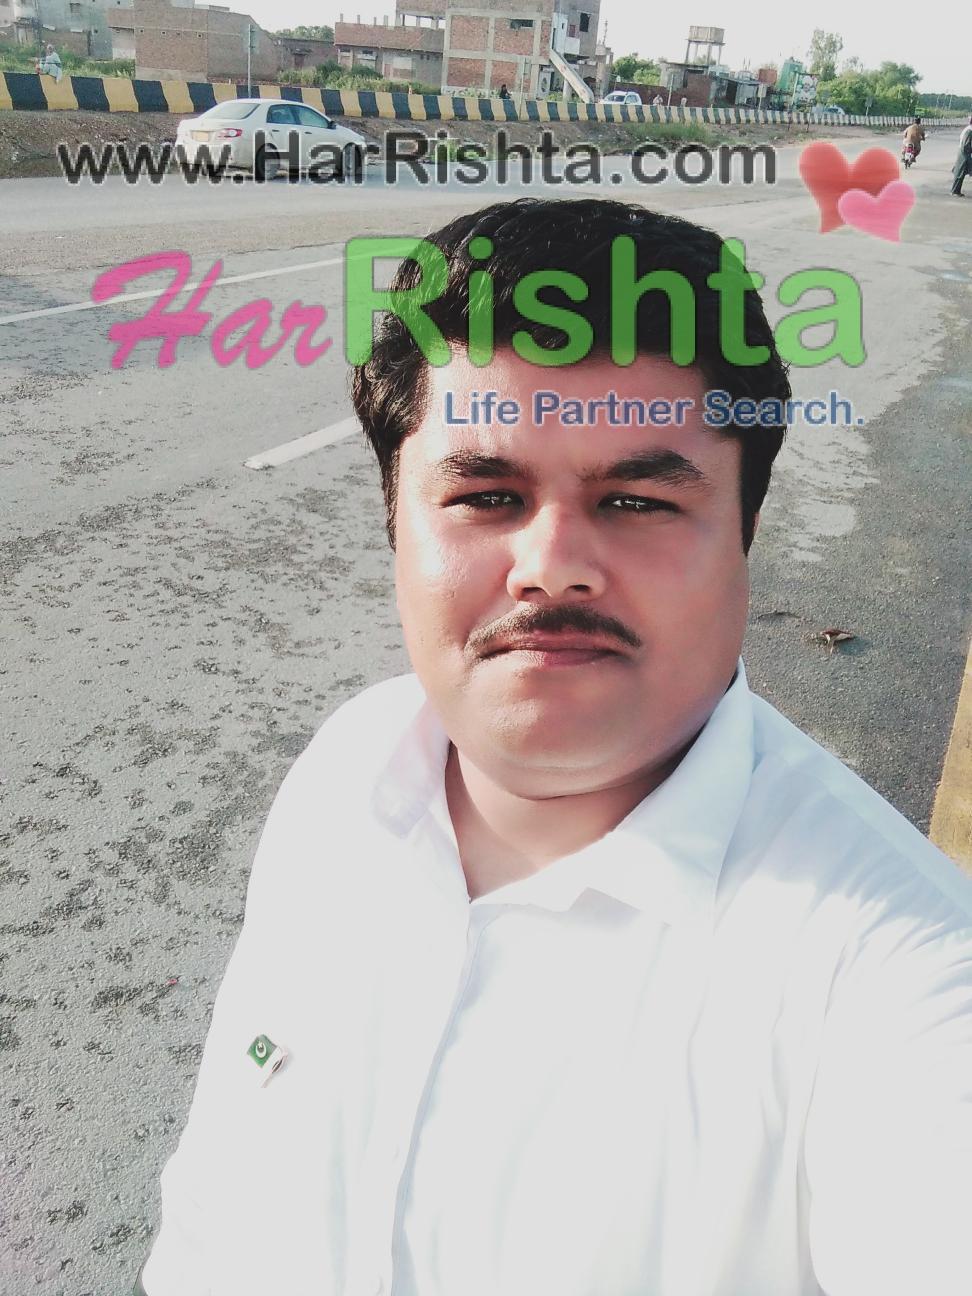 Abbasi Boy Rishta in Hyderabad